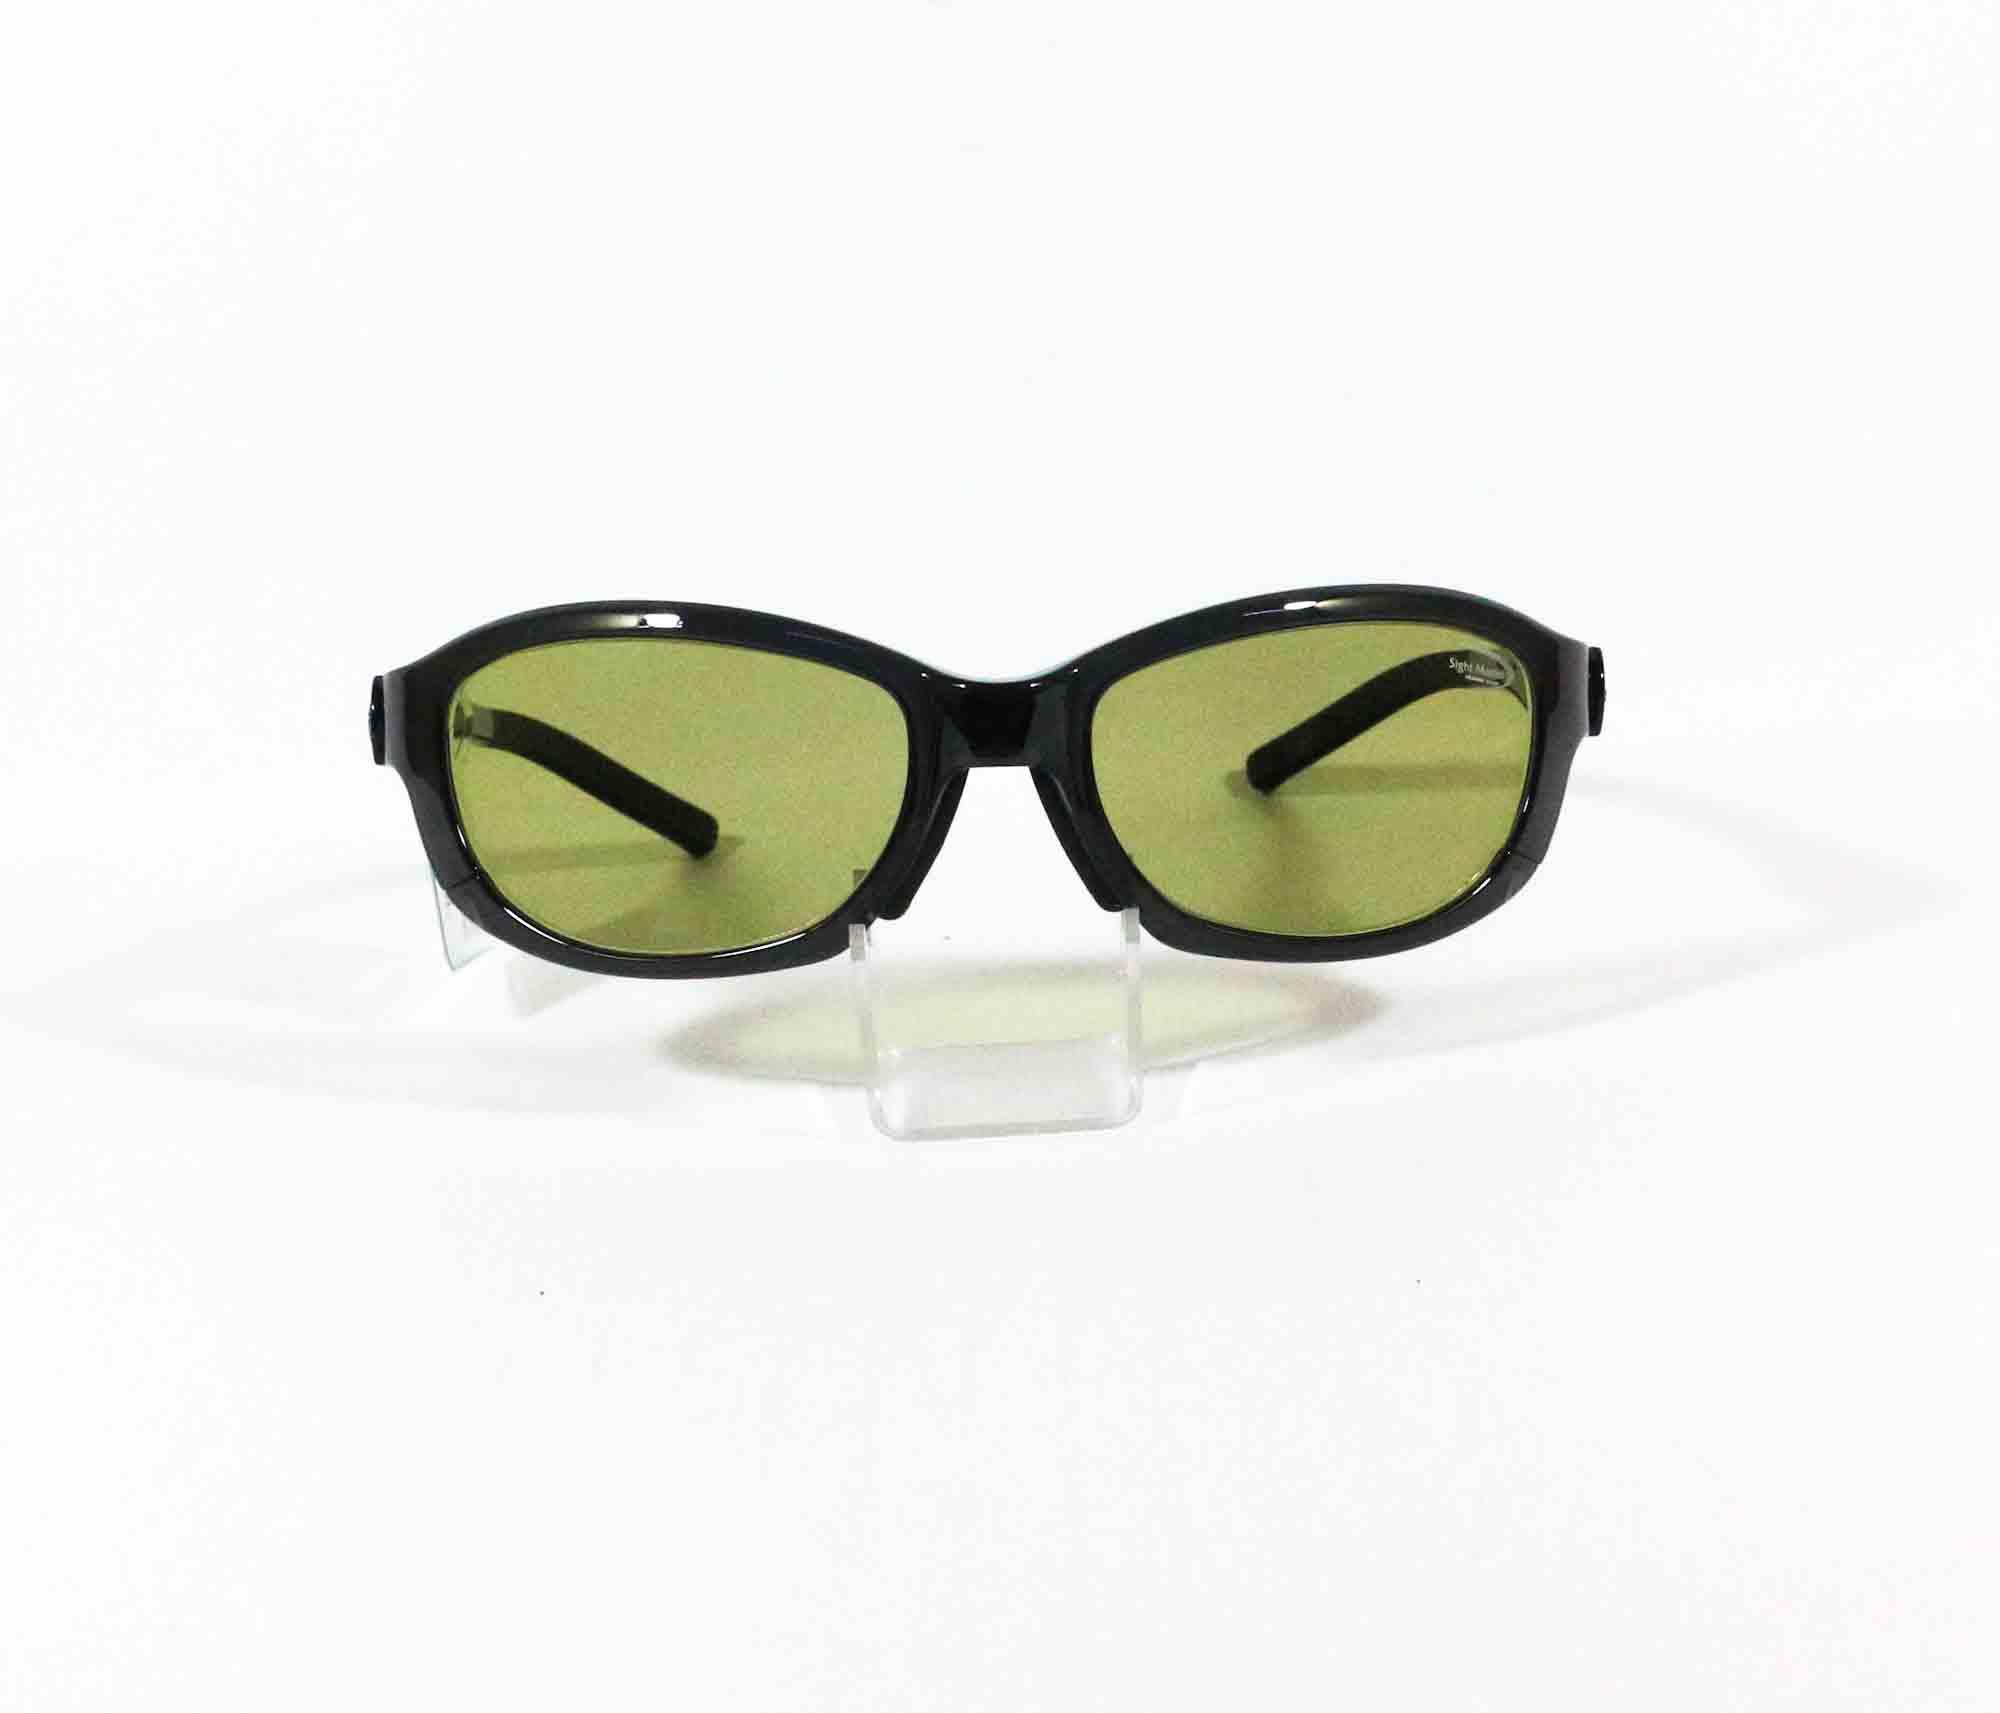 Tiemco Sight Master Sunglasses Scepter Smoke Ease Green (0993)